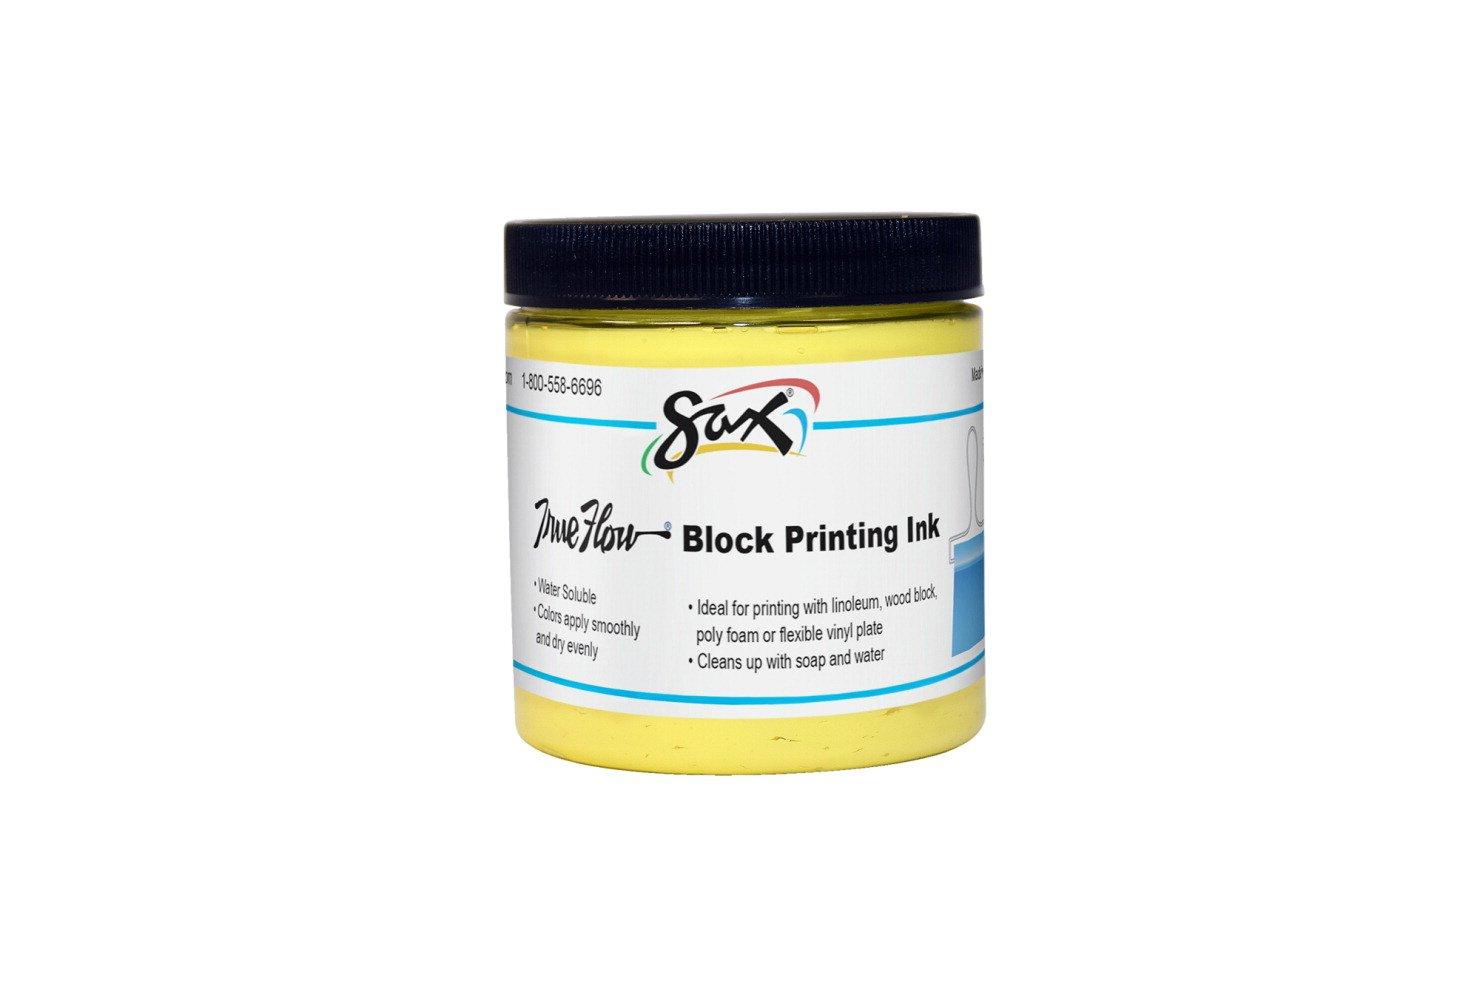 Sax True Flow Water Soluble Block Printing Ink - 8 Ounce. Jar - Yellow